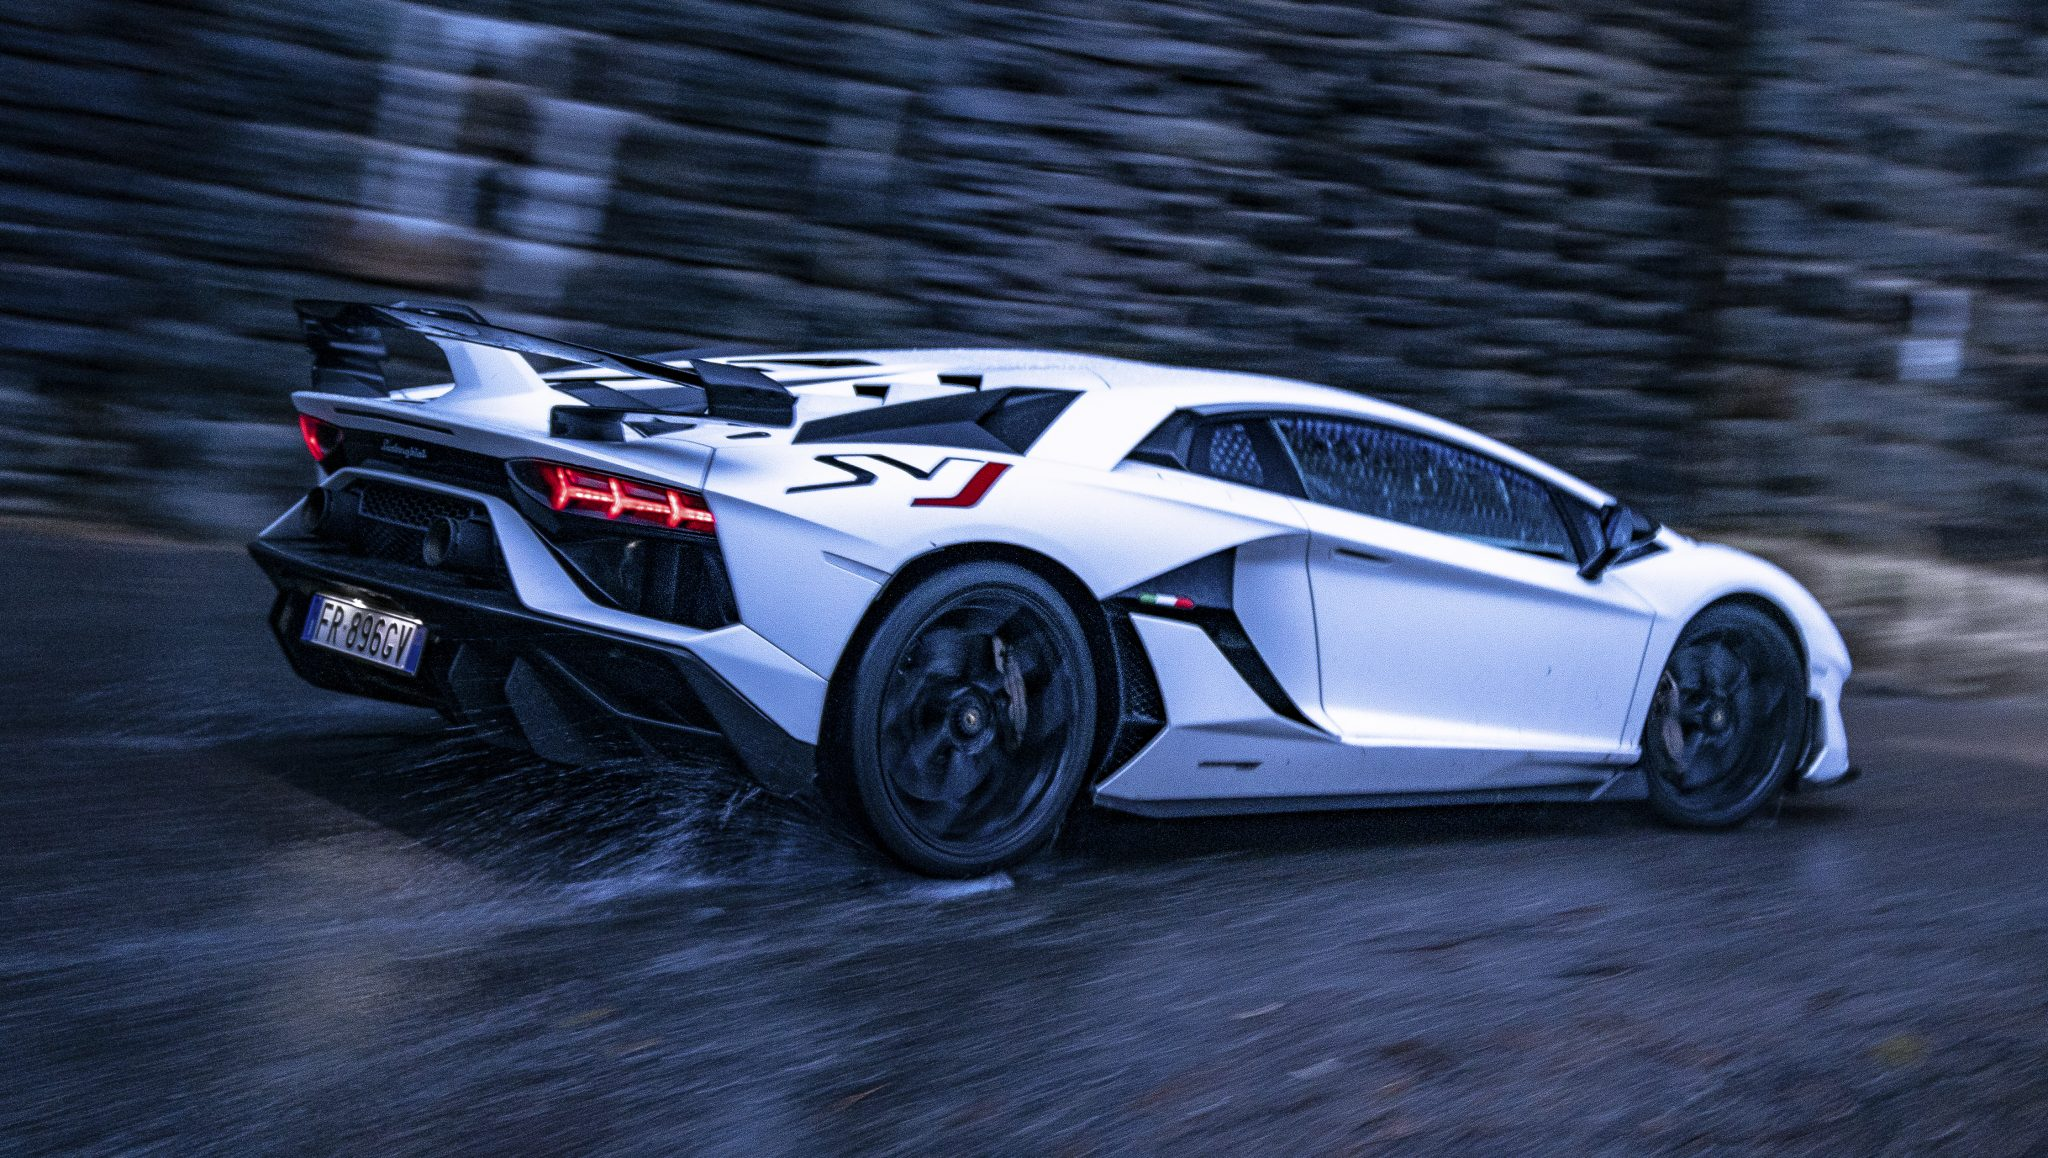 Witte Lamborghini Aventador SVJ